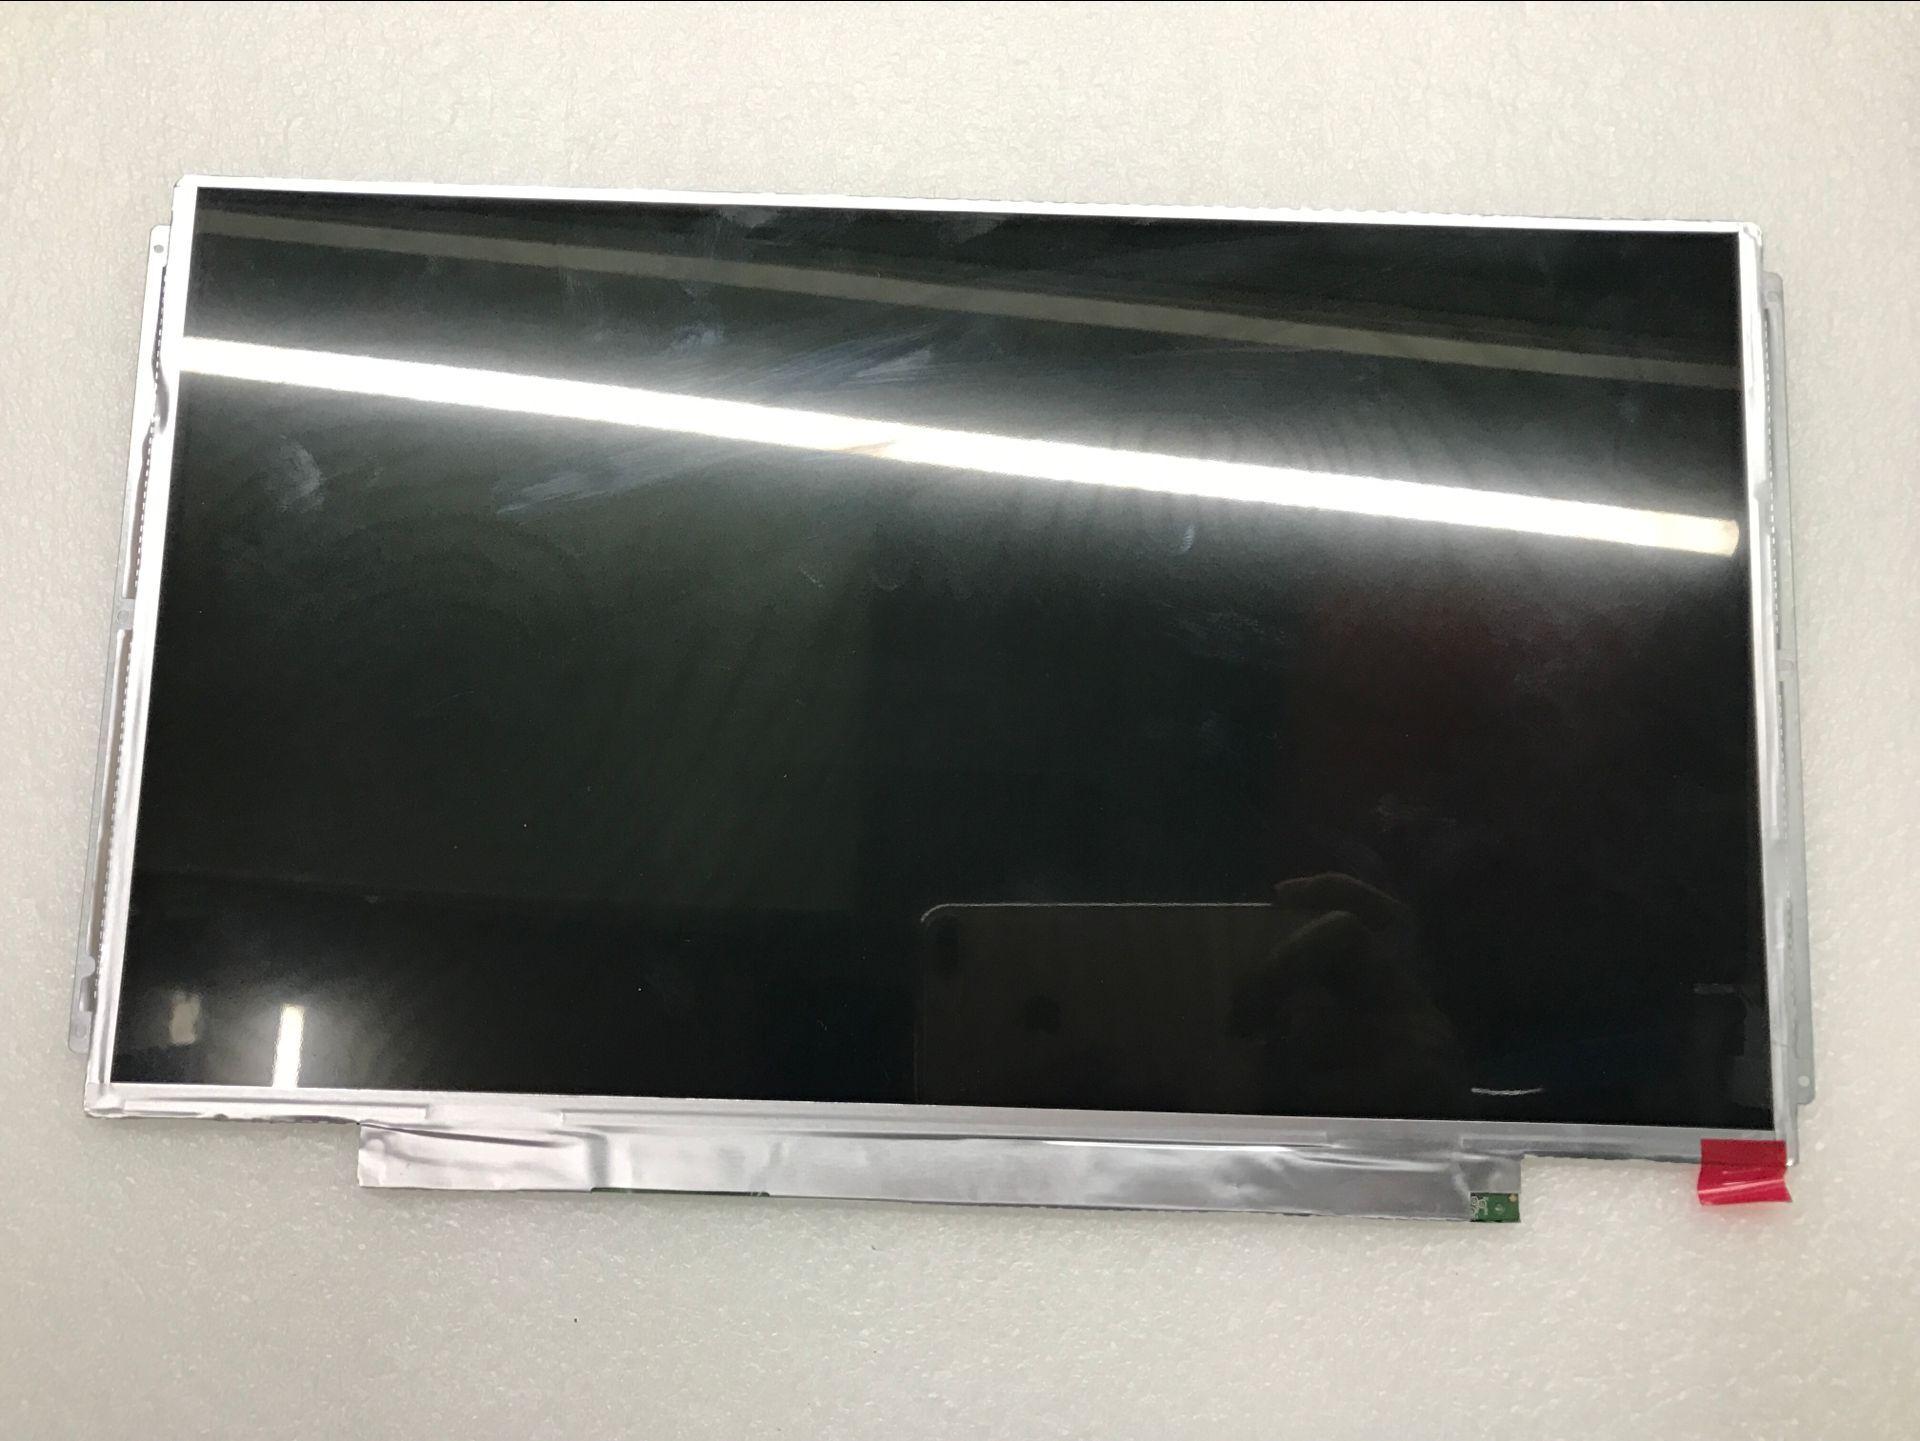 Schermo LCD Fit B133XW03 V.1 V.5 CLAA133WB01A LP133WH2-TLM2 Display 13.3 LED SlimSchermo LCD Fit B133XW03 V.1 V.5 CLAA133WB01A LP133WH2-TLM2 Display 13.3 LED Slim